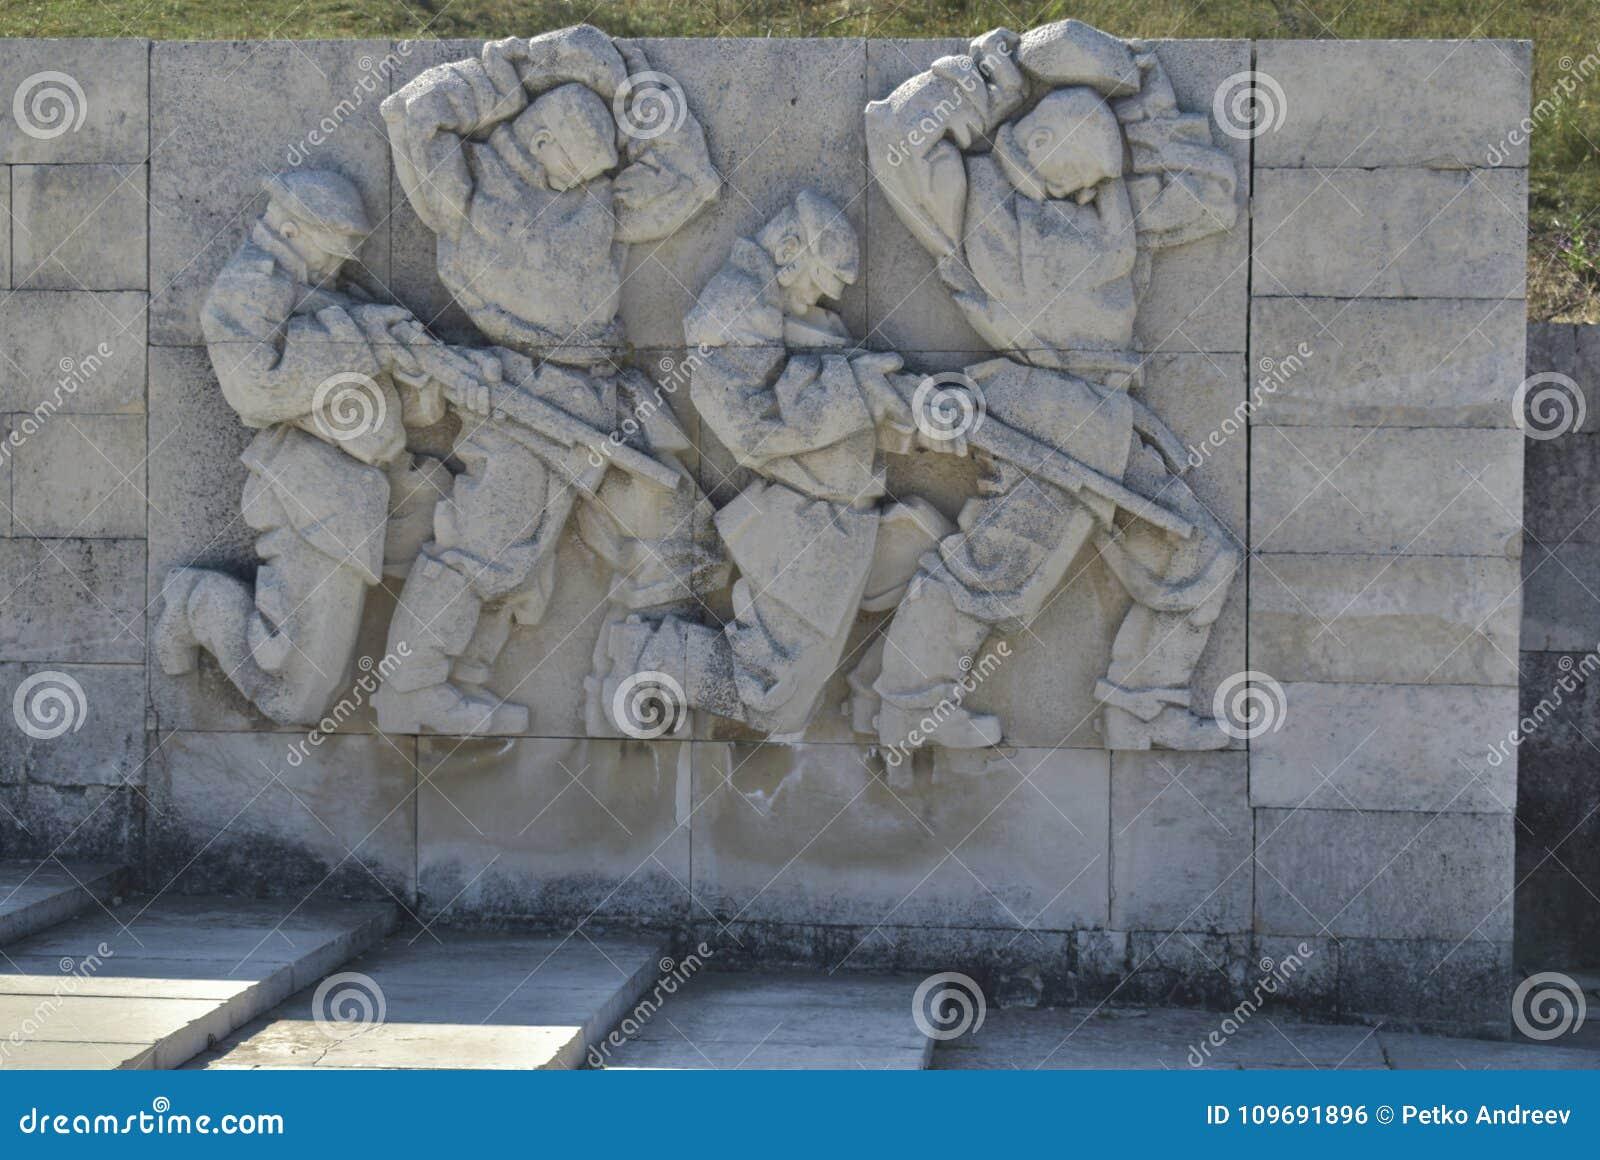 Памятник Shipka